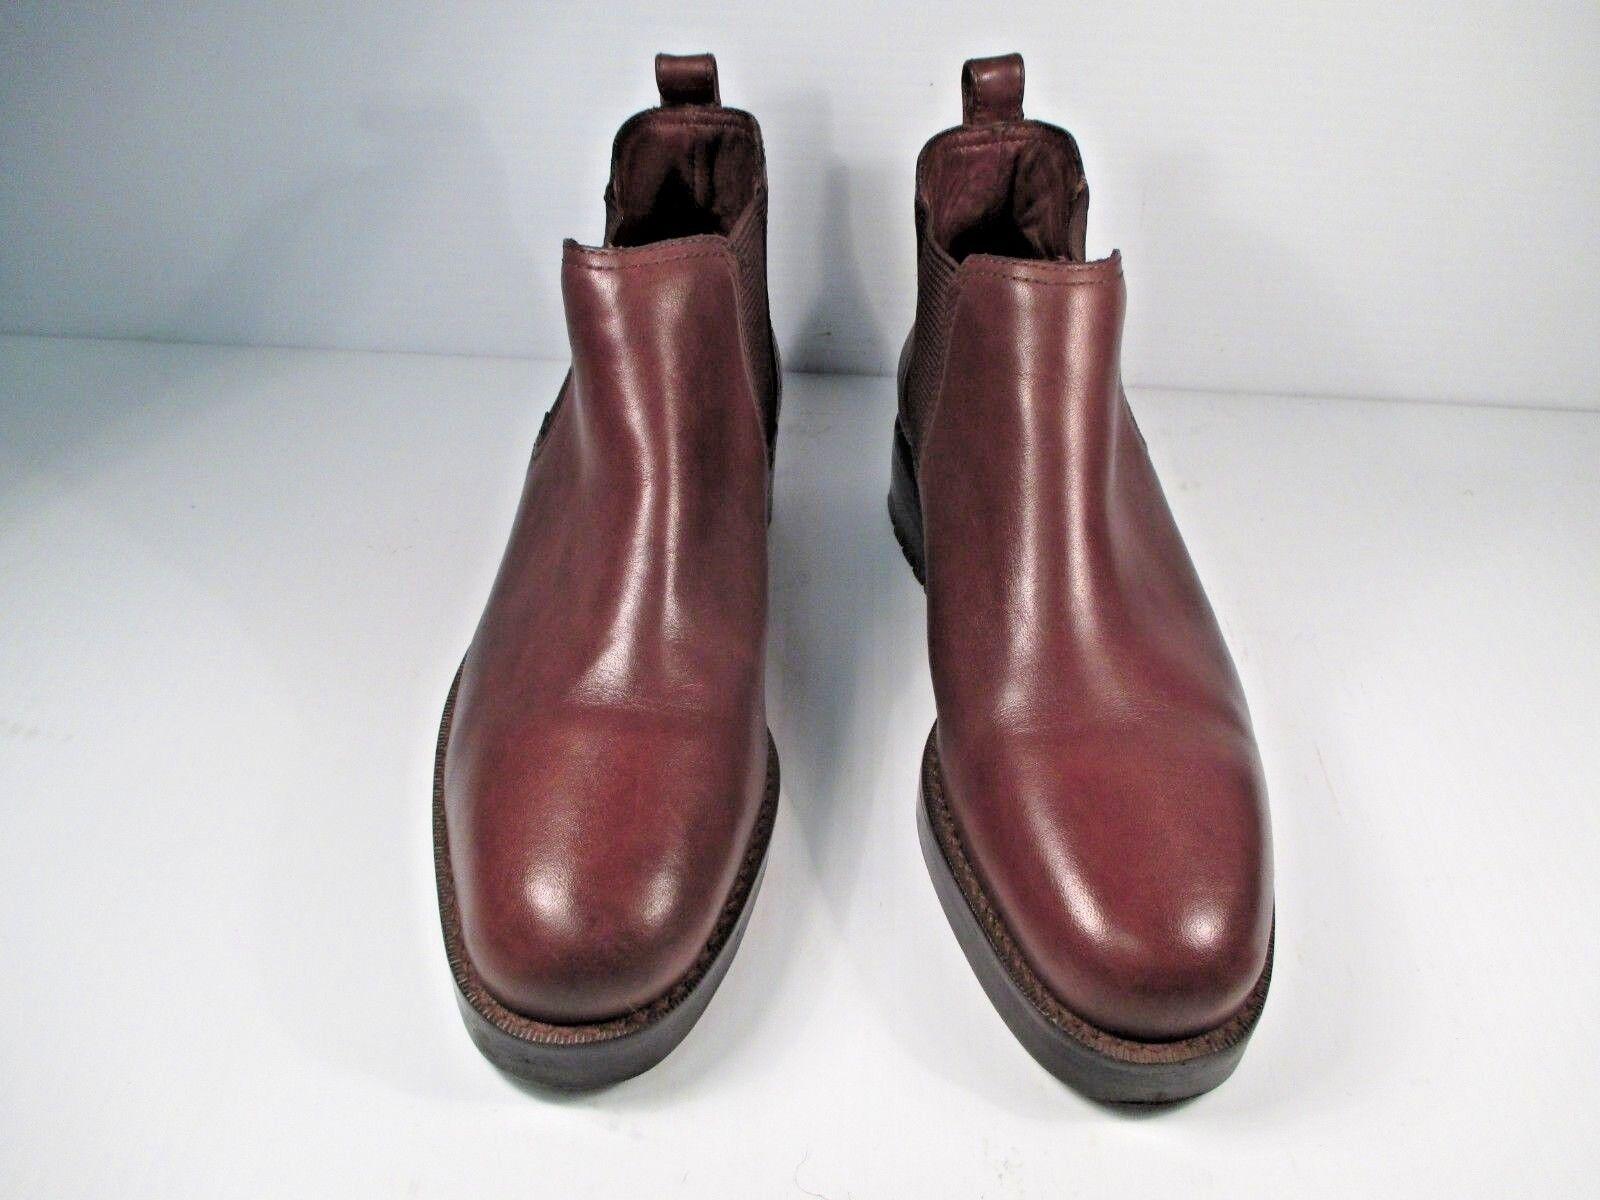 Marronee Leather Chelsea stivali Ralph Lauren Dimensione US 6 B